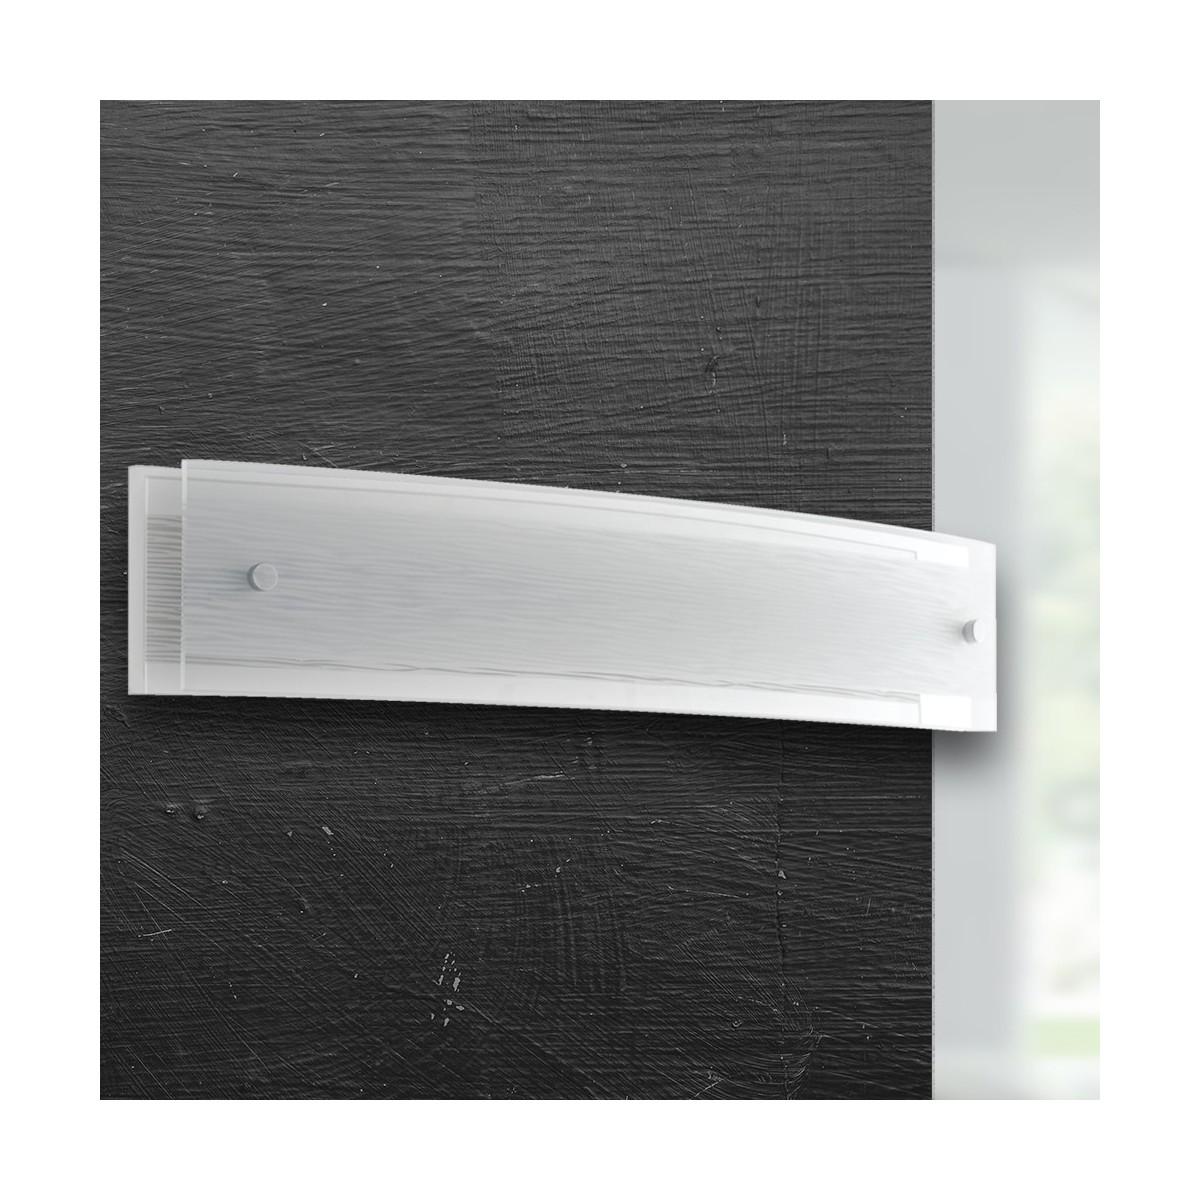 I-JOYCE/AP30X9 - Applique Rettangolare Vetro Decoro Linee Lampada Da Parete Led 10 watt Luce Naturale